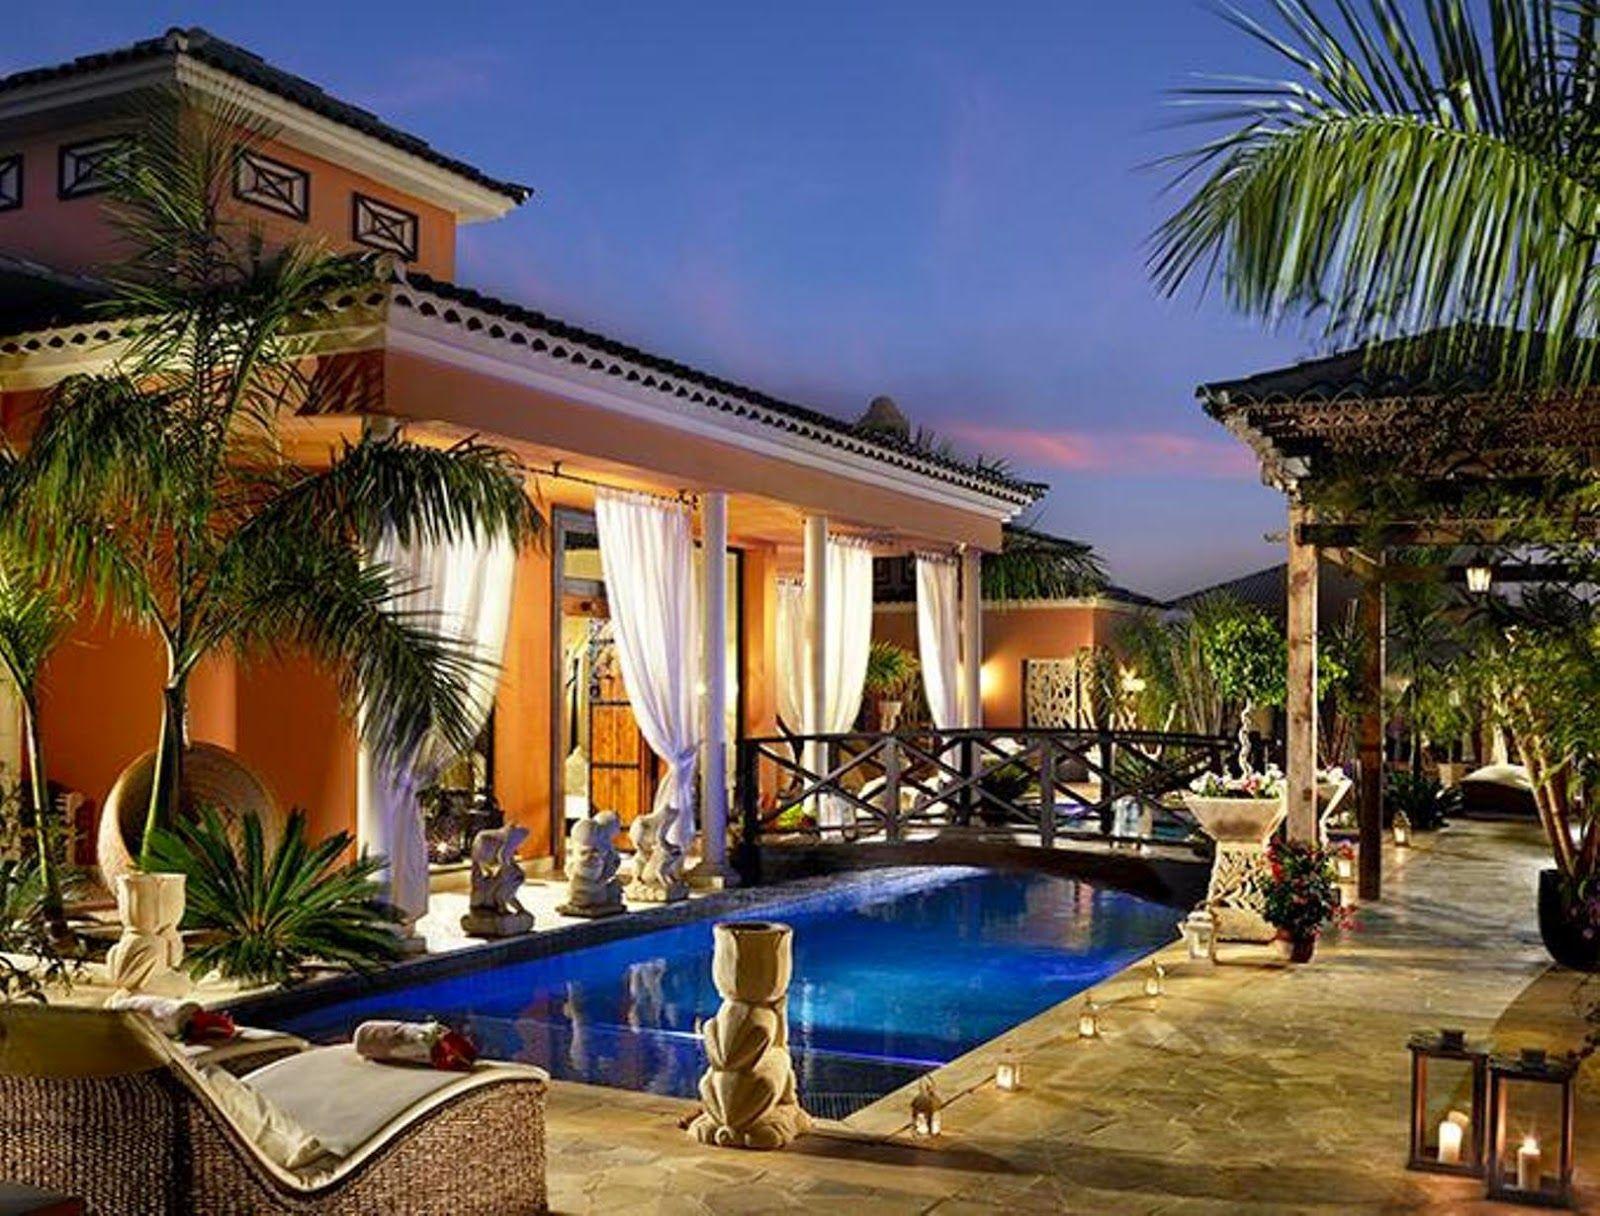 0203699278b35dffb758b558f1f473c3 - Tenerife Royal Gardens Apartments For Sale